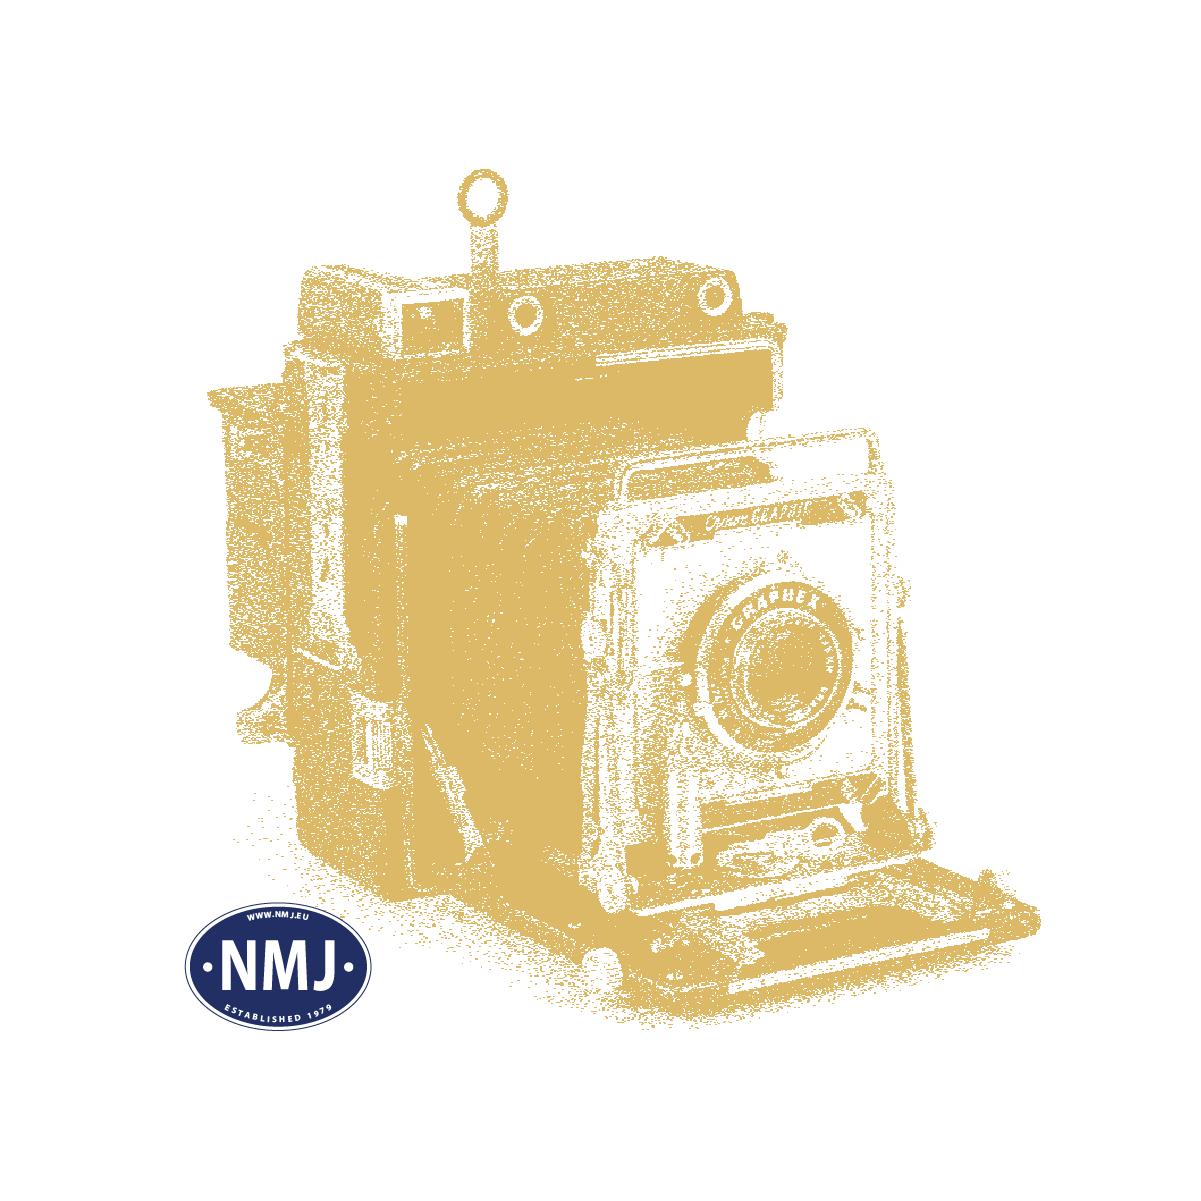 NMJ DVD - Skandinaviske Intrykk